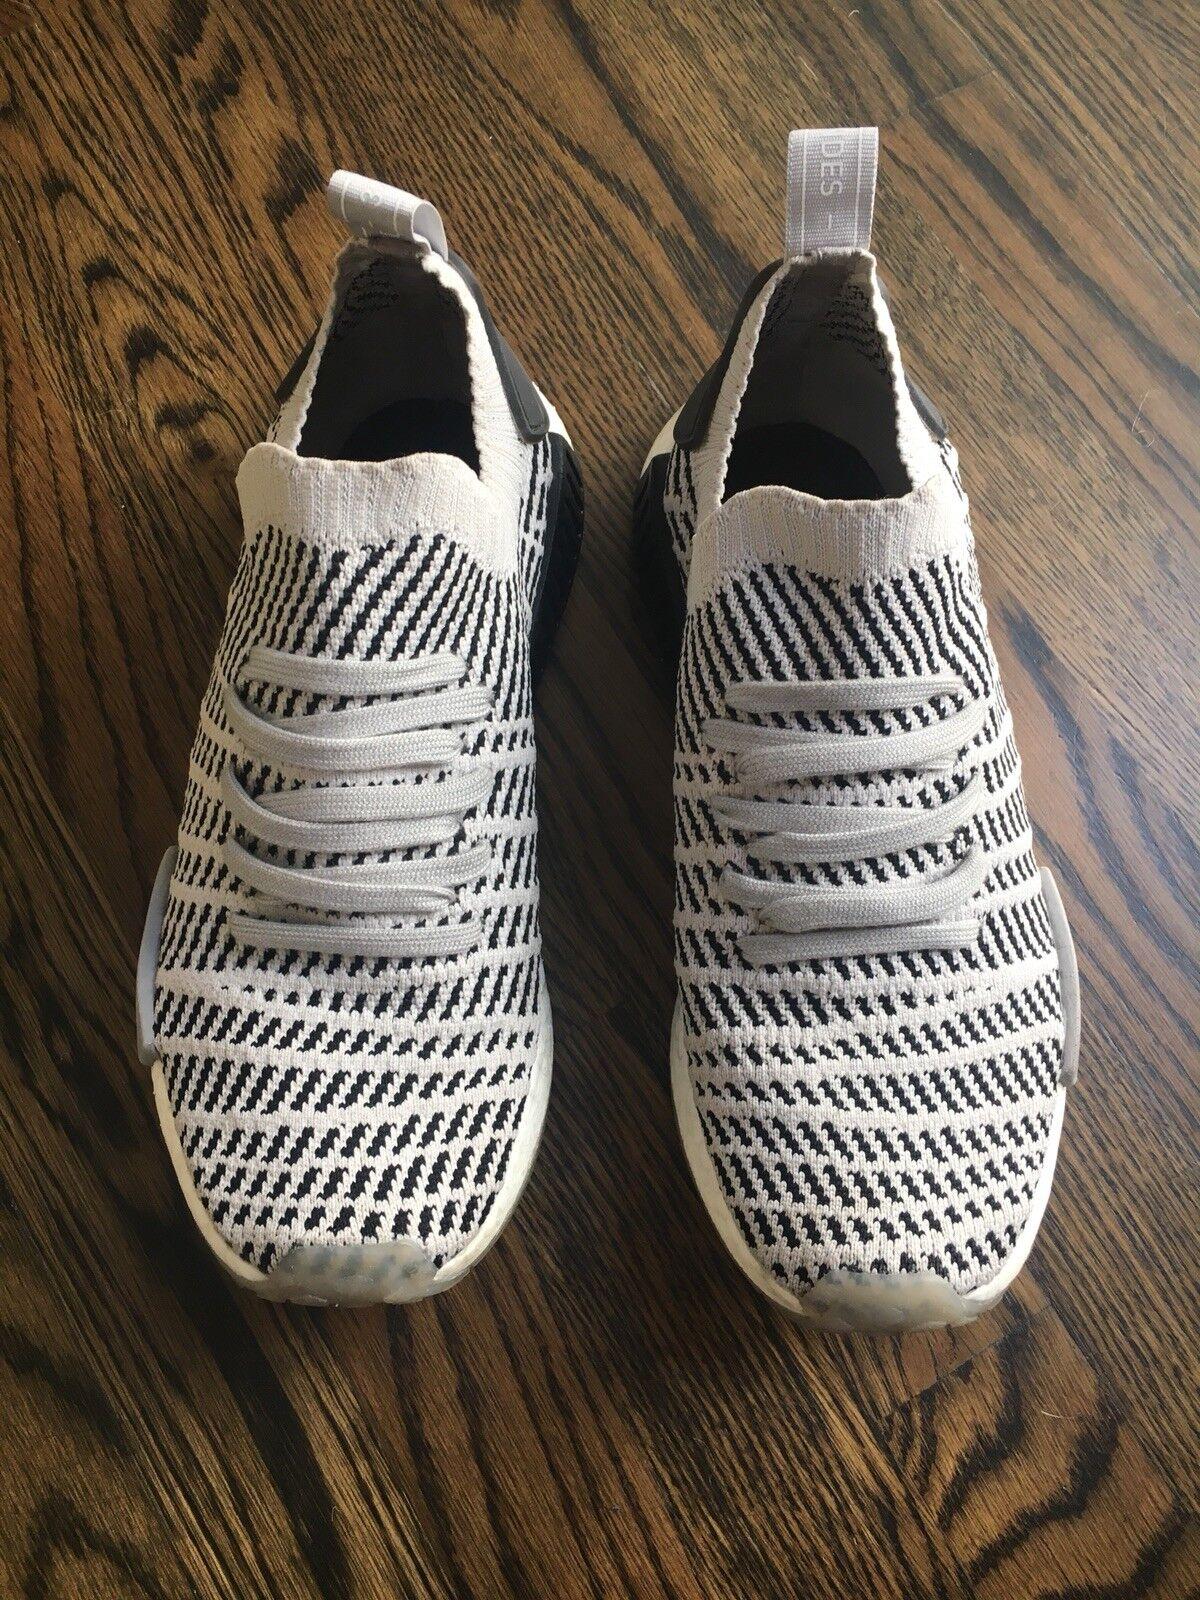 Men's Adidas NMD Runner - R1 STLT Primeknit Shoes - Runner Grey/Core Black, Sz 9 05fd72